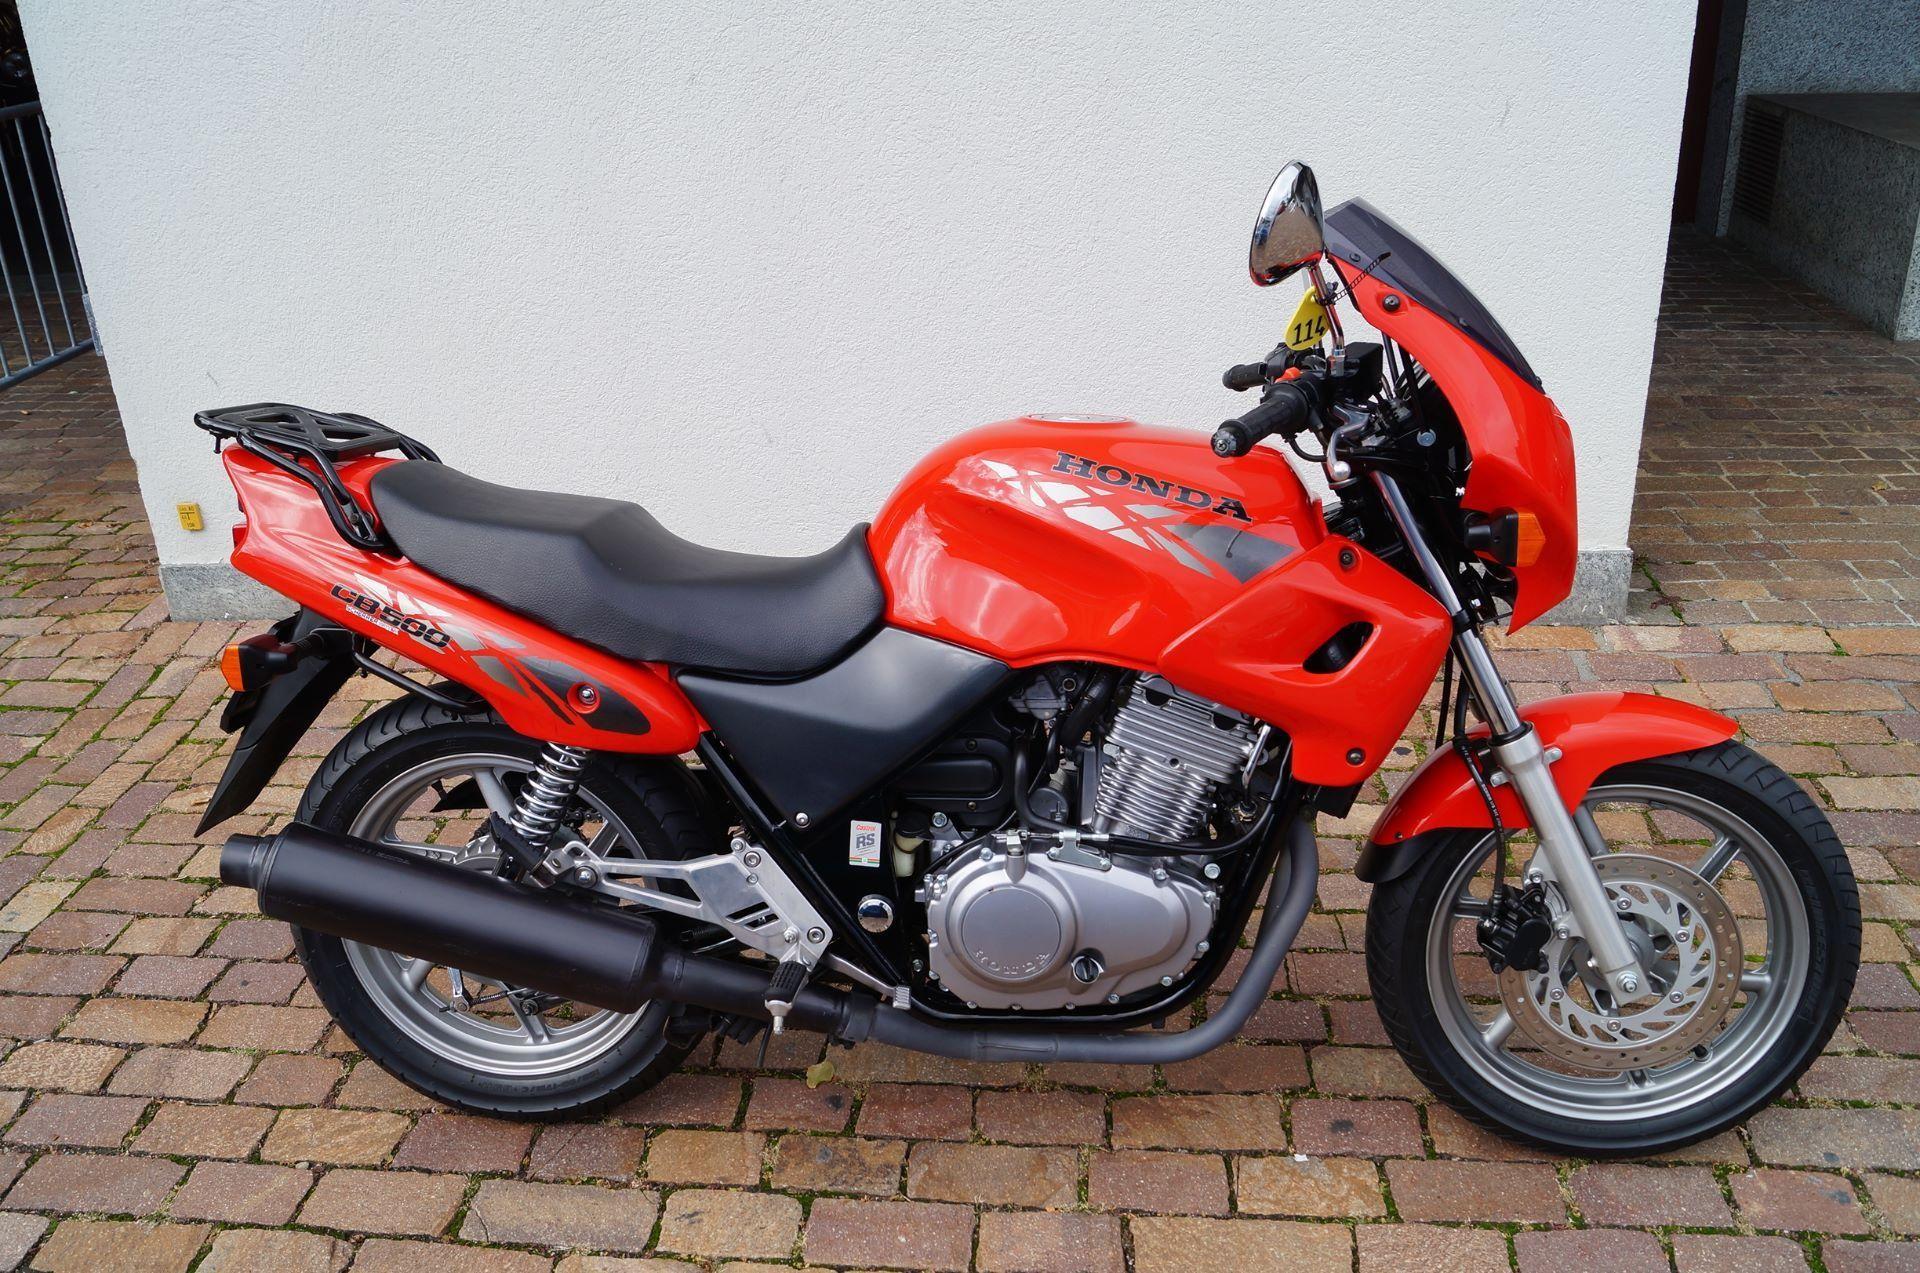 motorrad occasion kaufen honda cb 500 scherrer motos ag steckborn. Black Bedroom Furniture Sets. Home Design Ideas